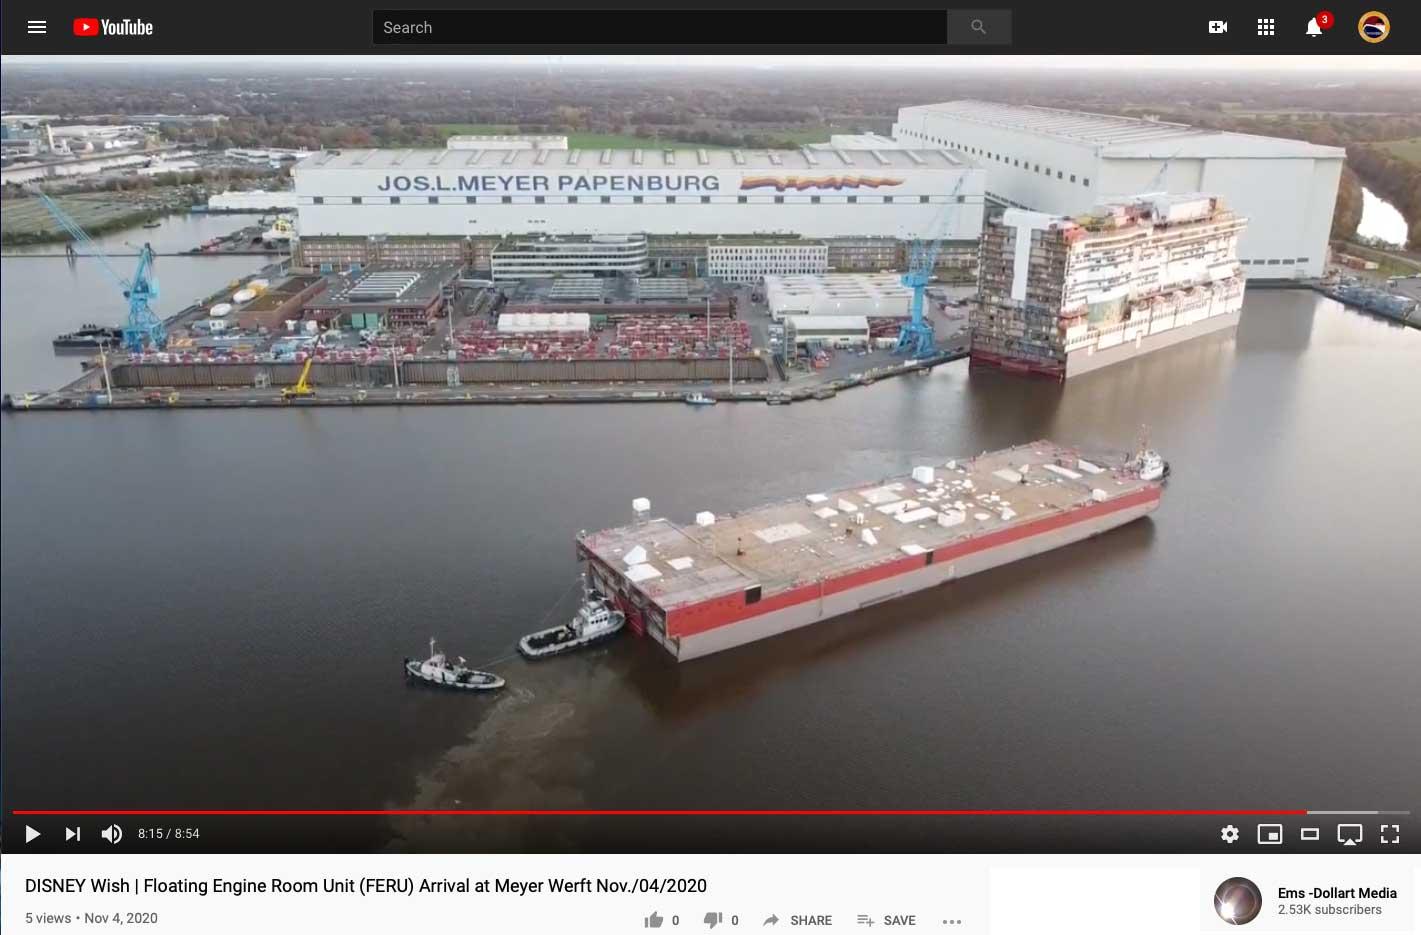 Disney Wish FERU Meyer Werft Papenburg Germany 20201104